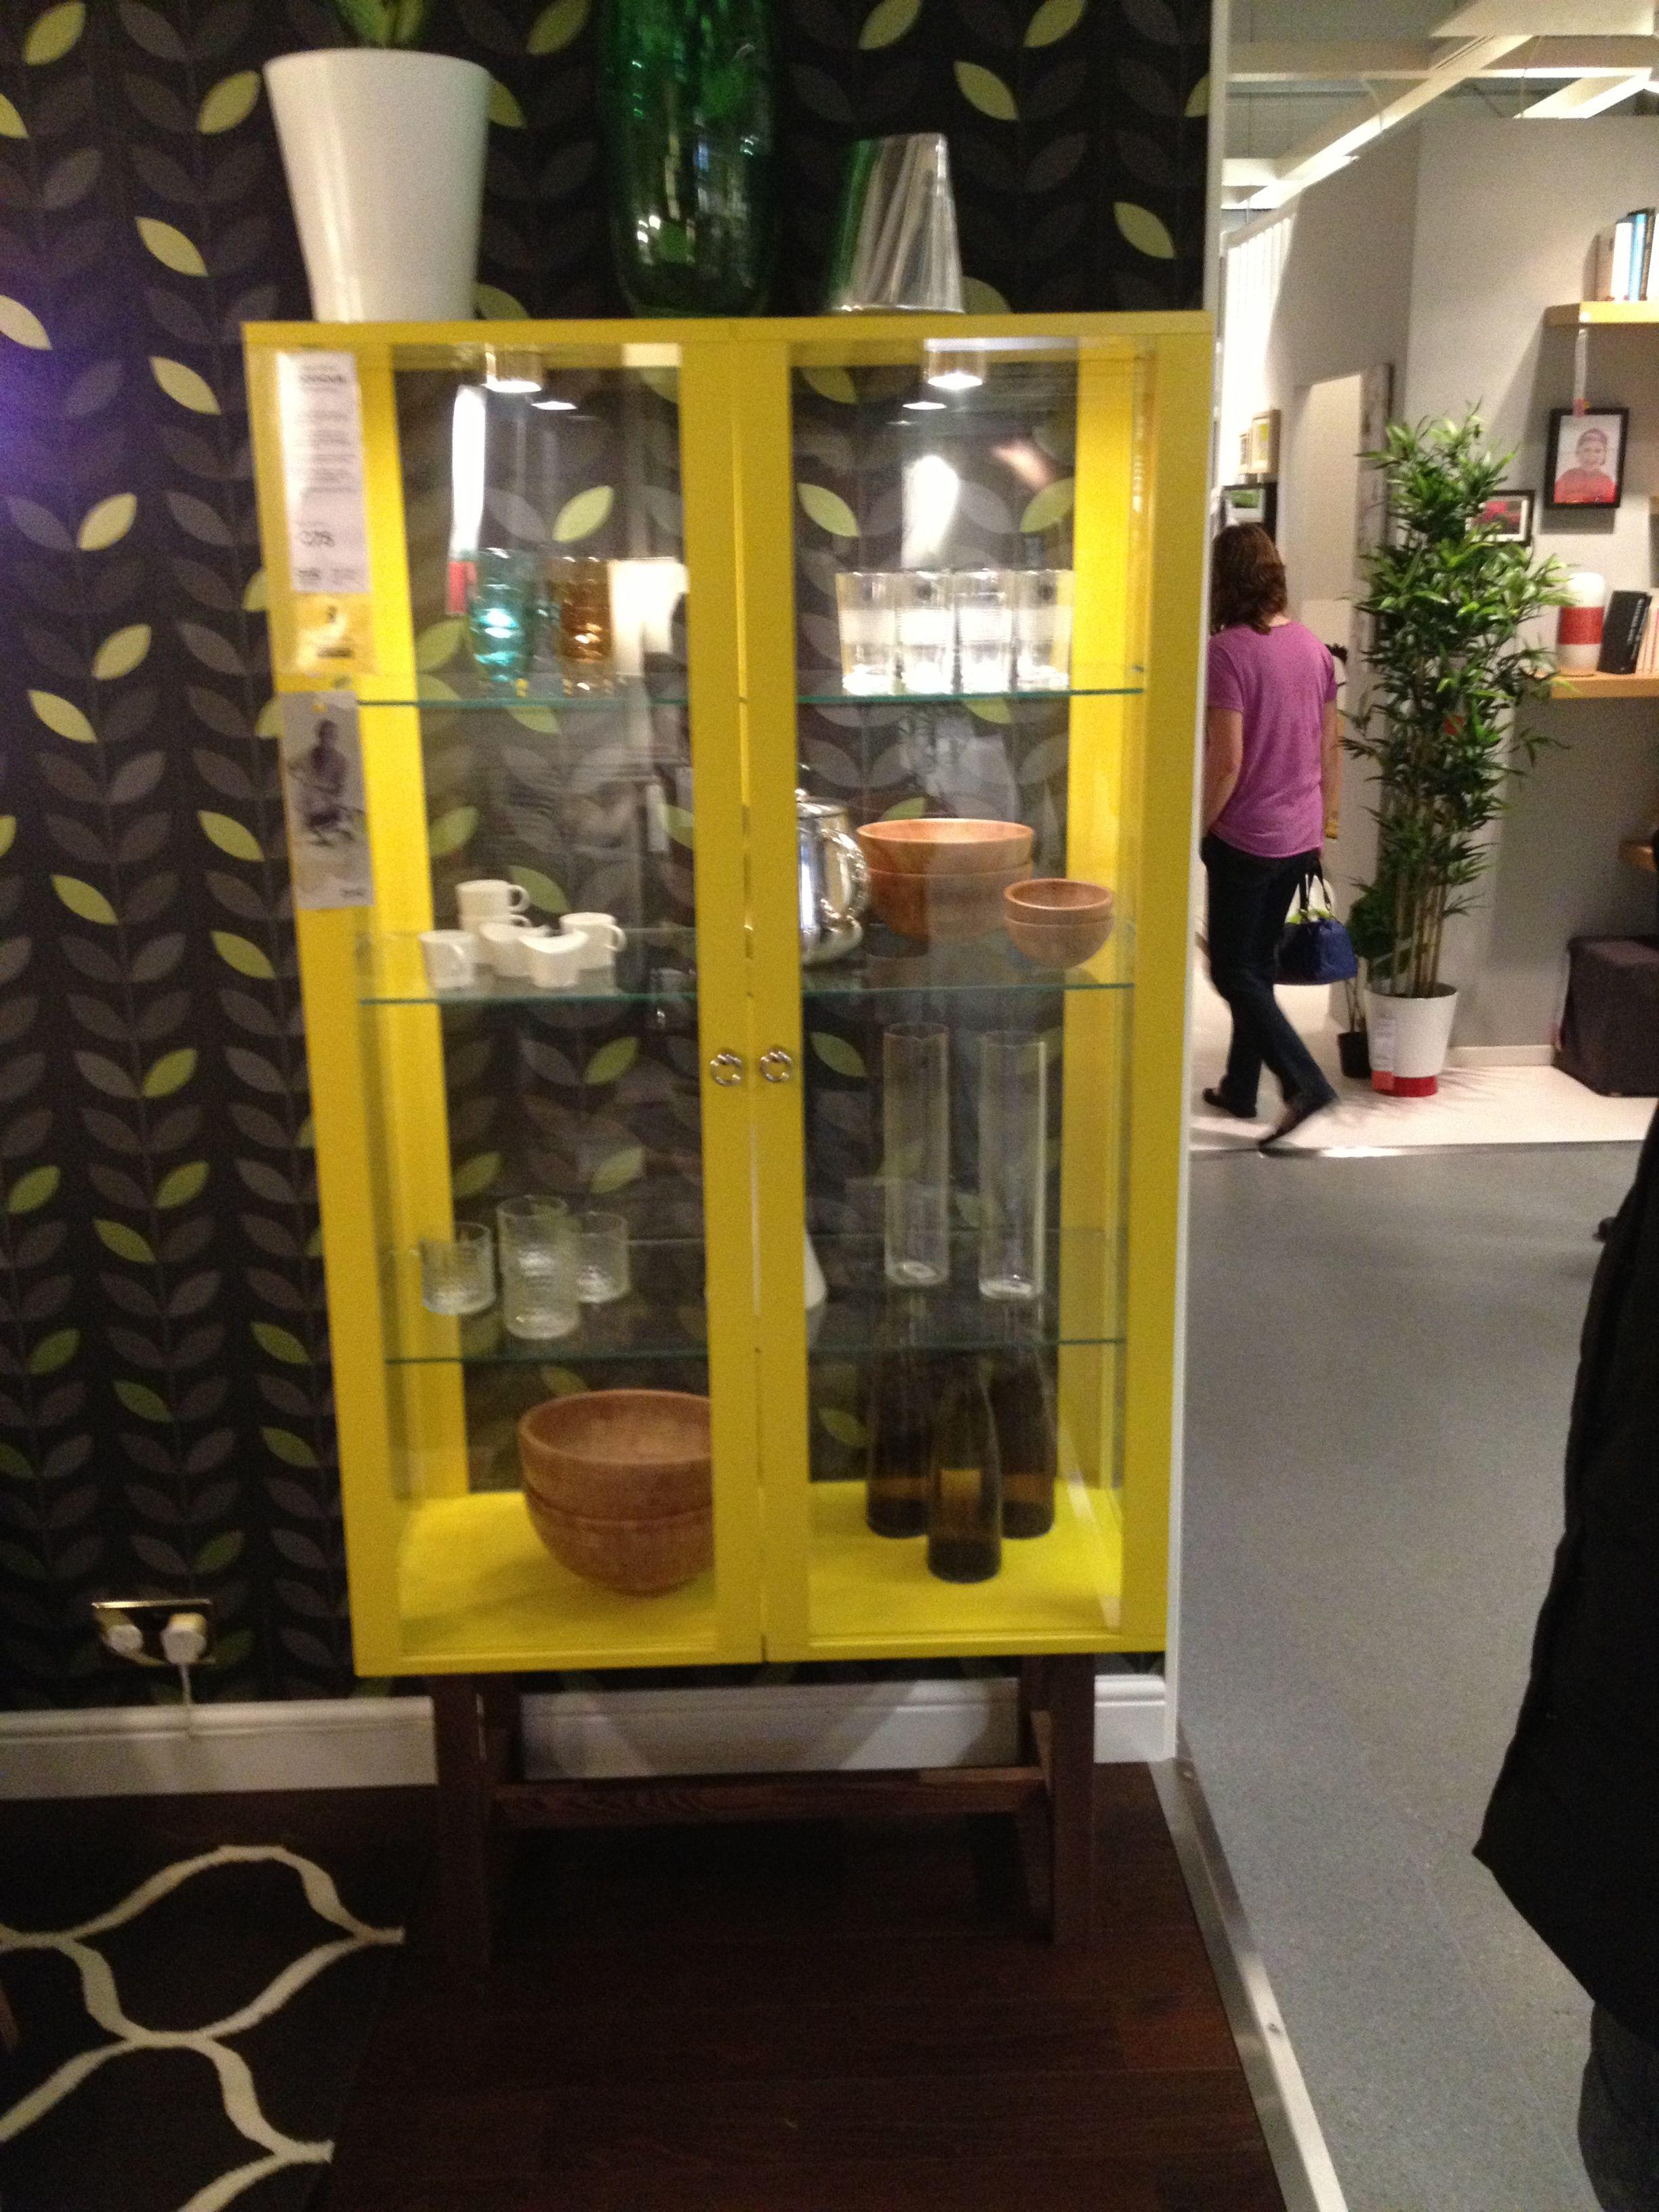 Ikea Kinderbett Doppelstock ~ Yellow cabinet from Ikea  I K E A  Pinterest  Ikea, Cabinets and